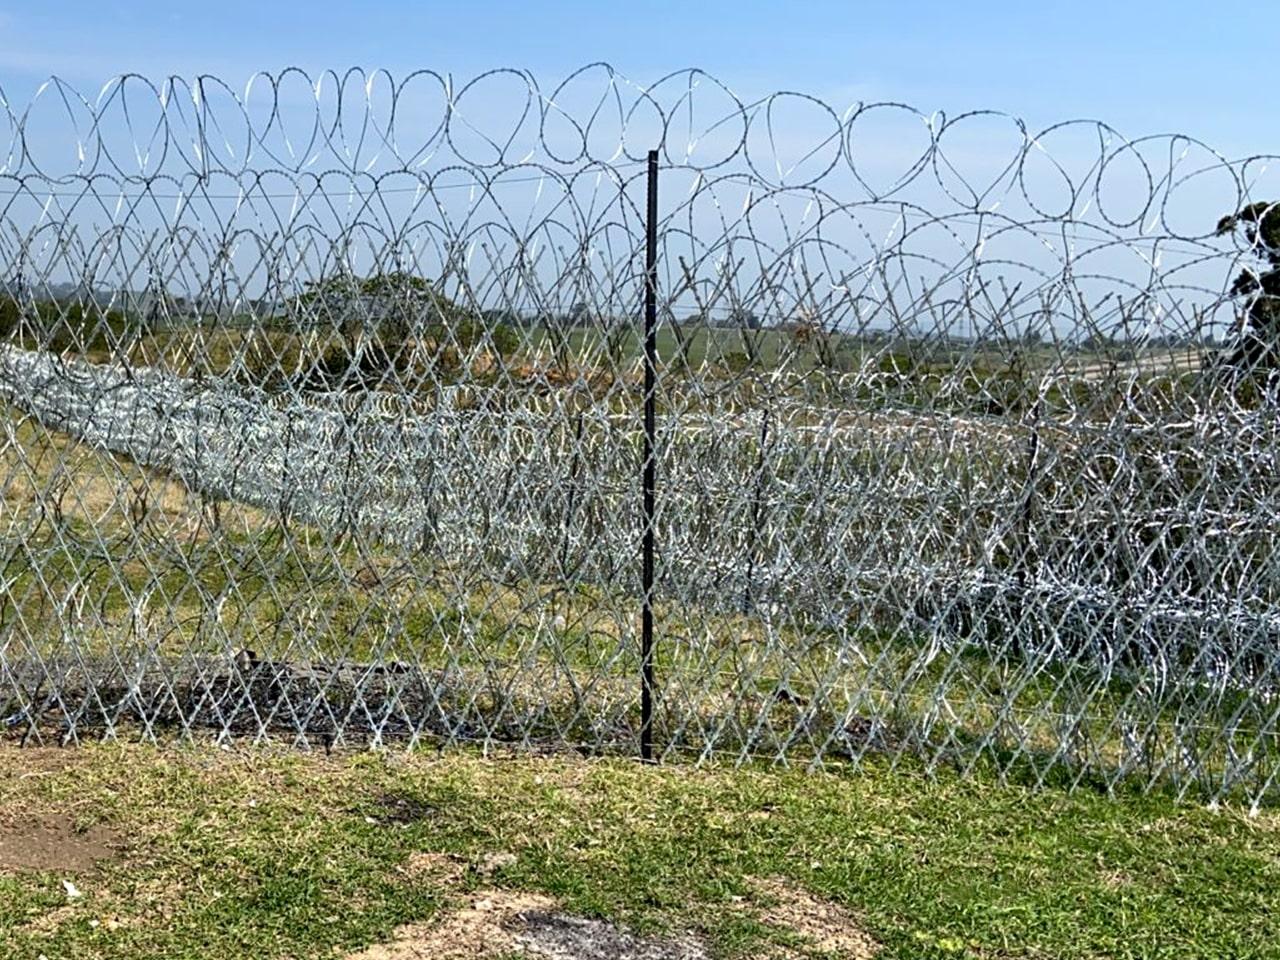 Concertina razor wire coils as wall